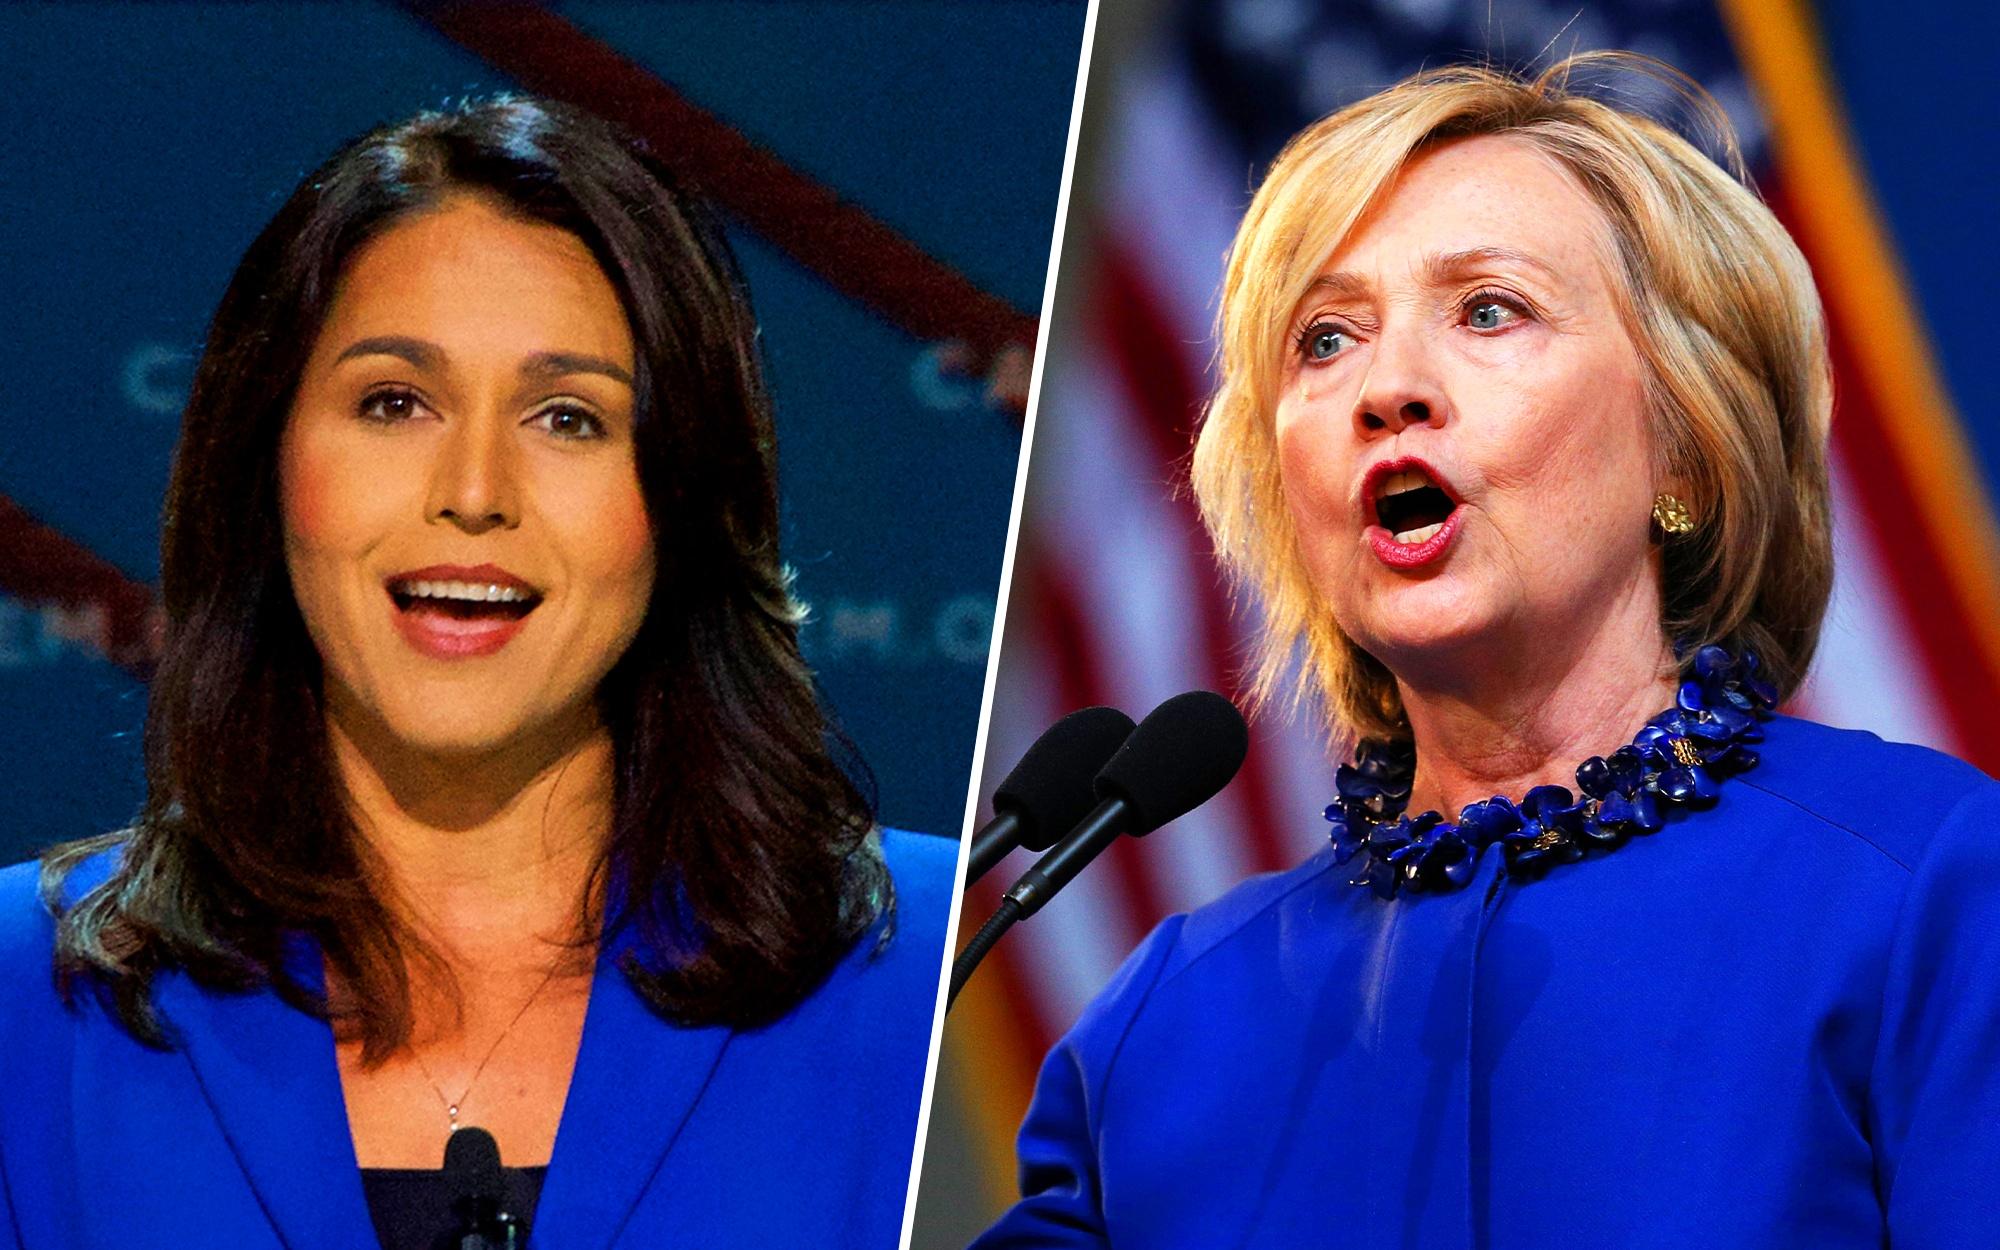 Tulsi Gabbard Announces $50M Lawsuit Against Hillary Clinton